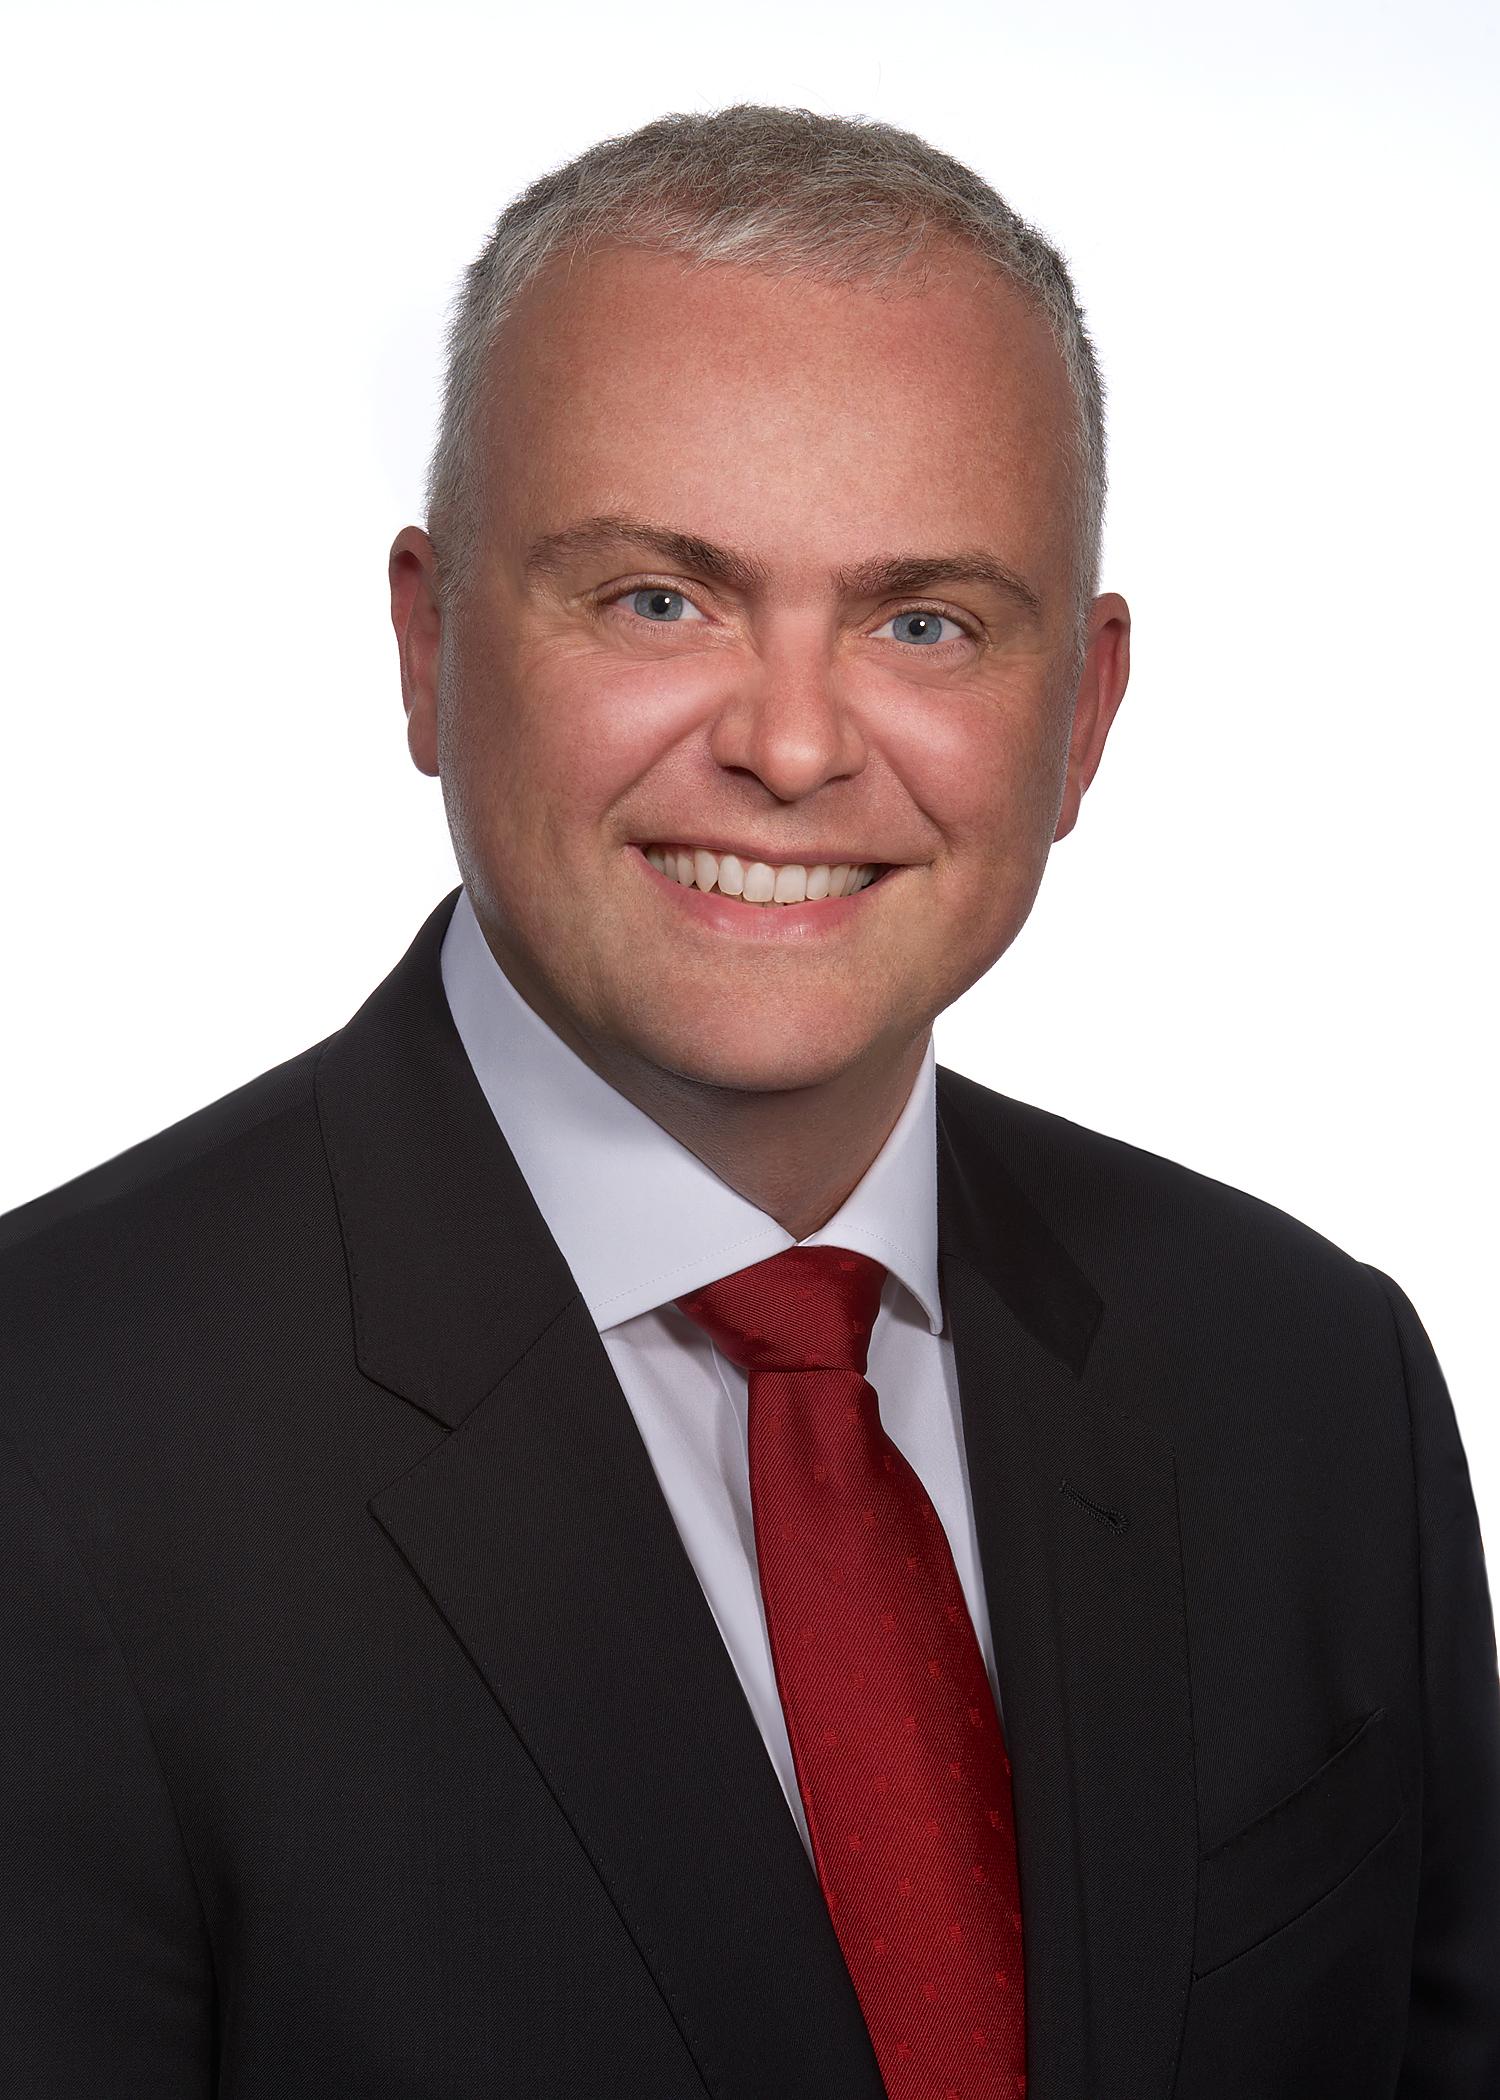 Frank Steinert appointed Head of Human Resources, Henkel North America (Photo: Business Wire)